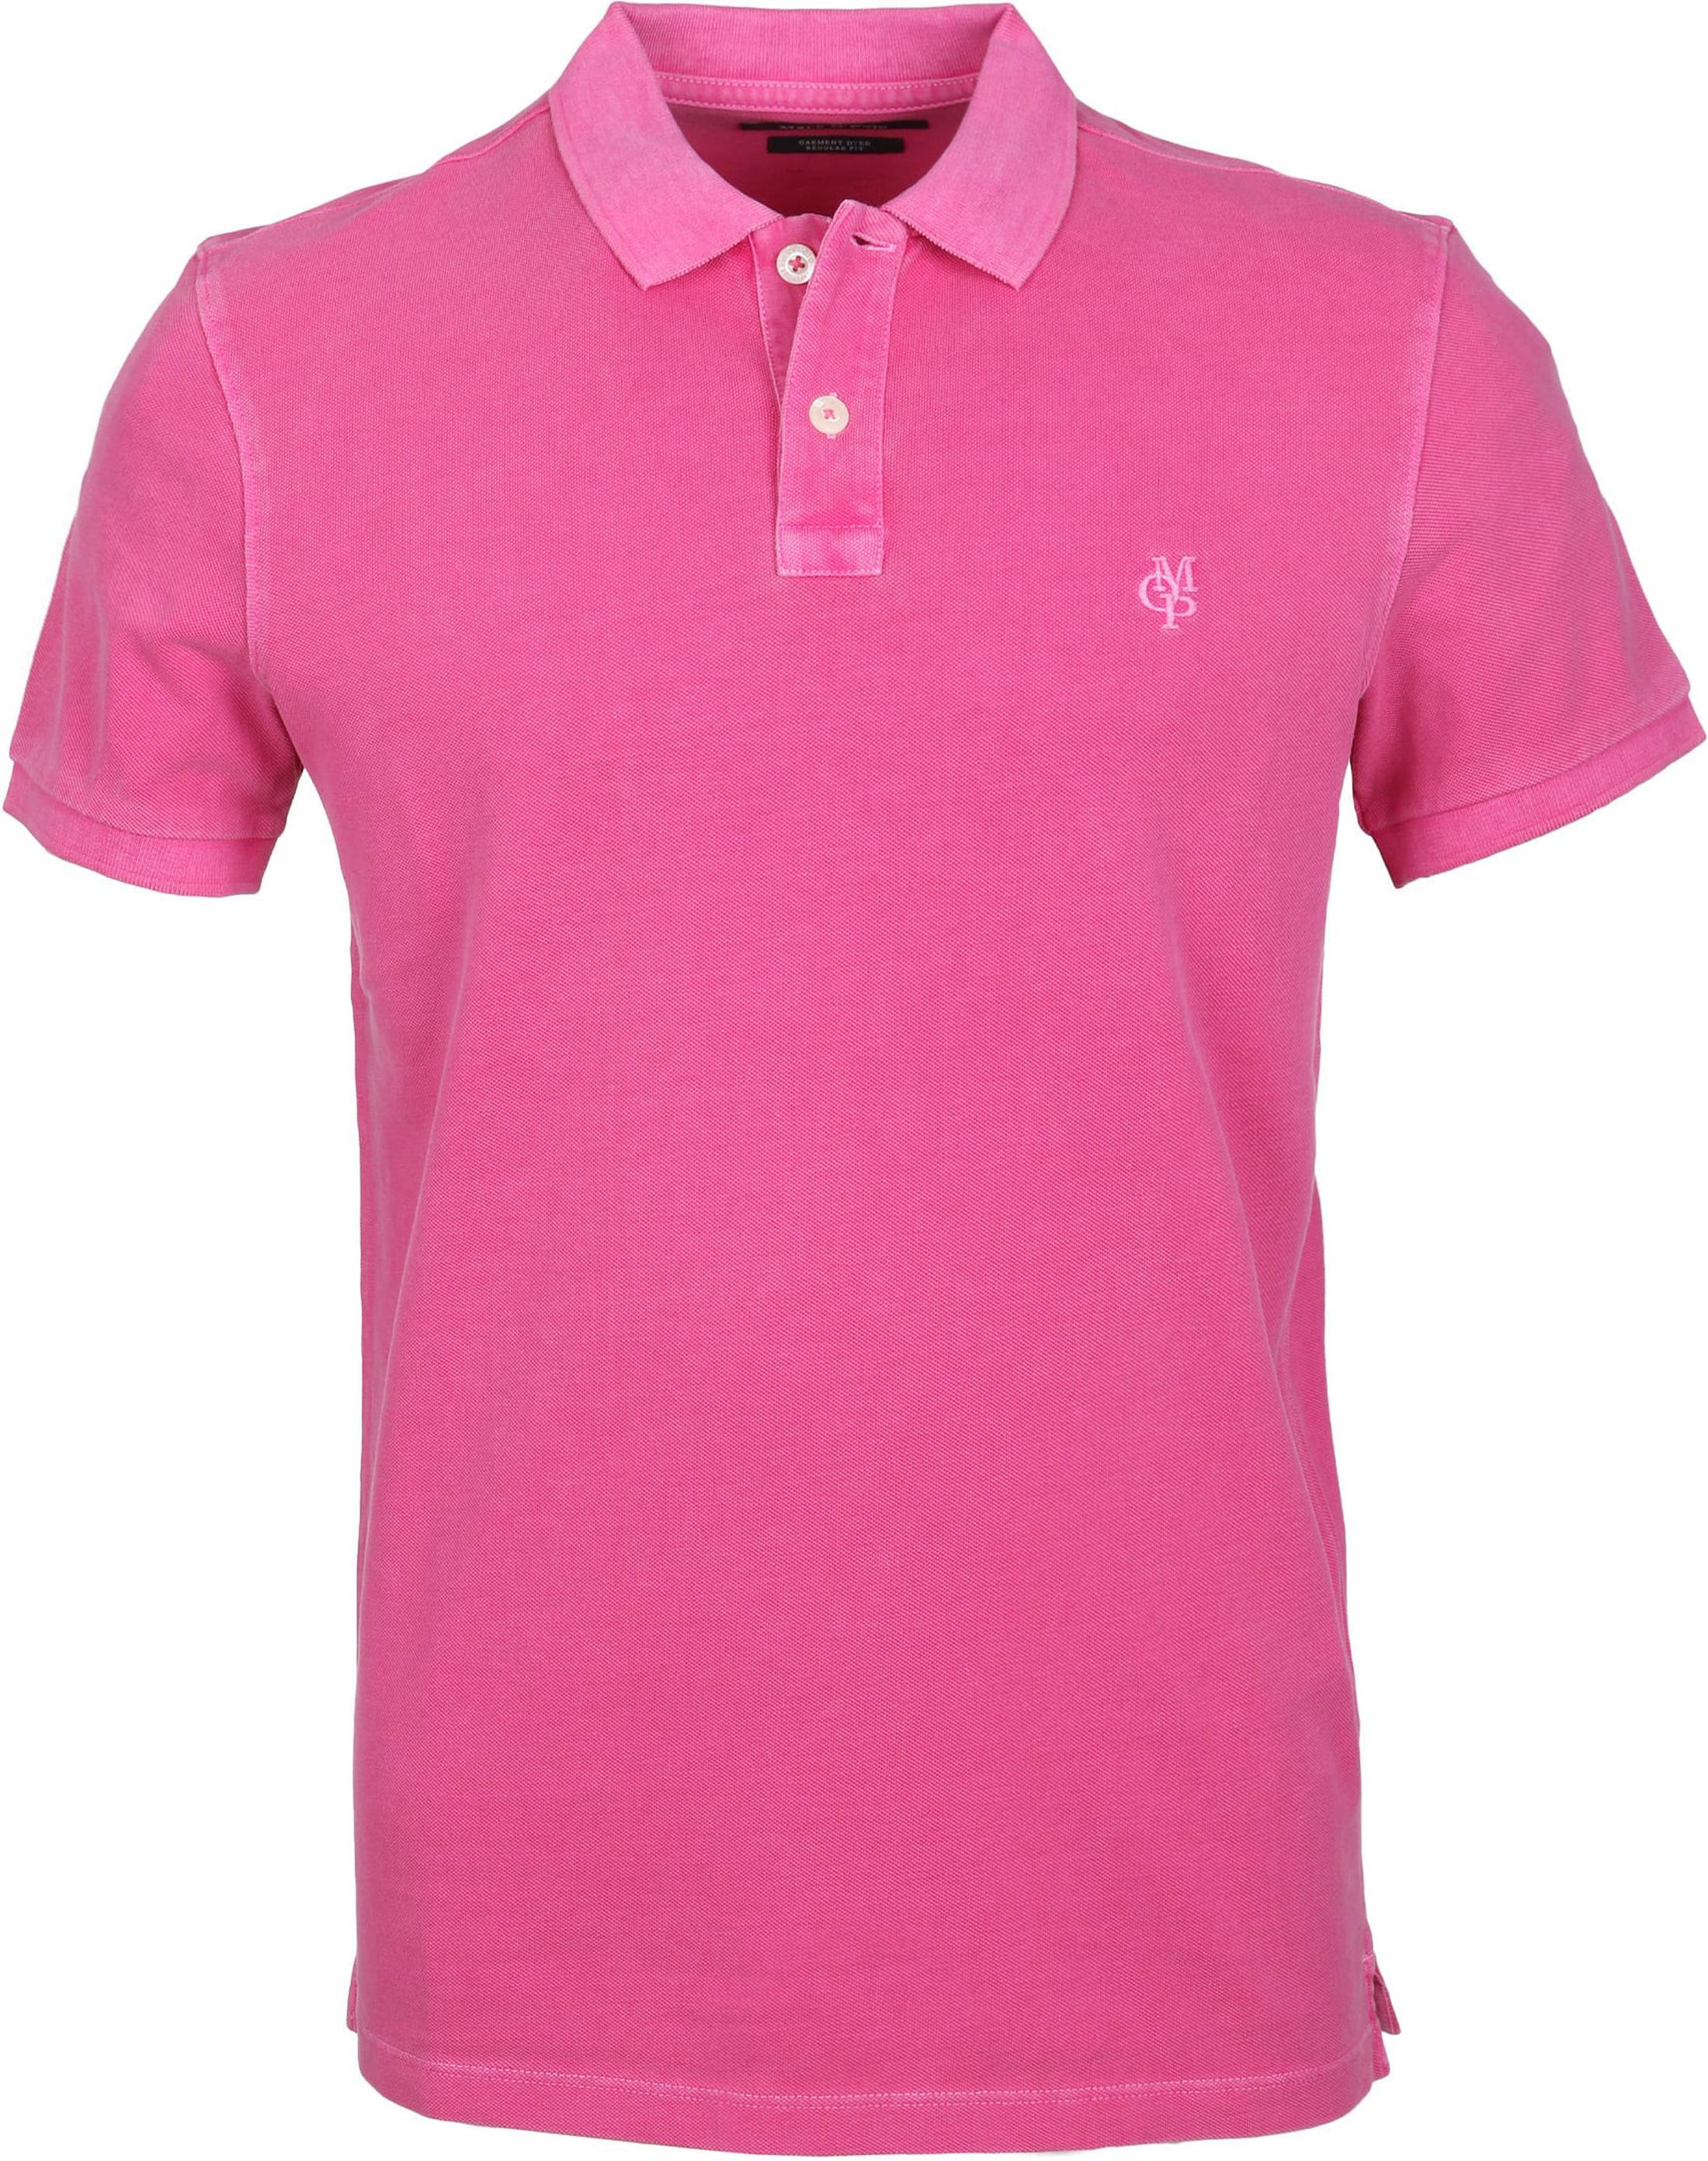 Marc O'Polo Poloshirt Uni Roze foto 0